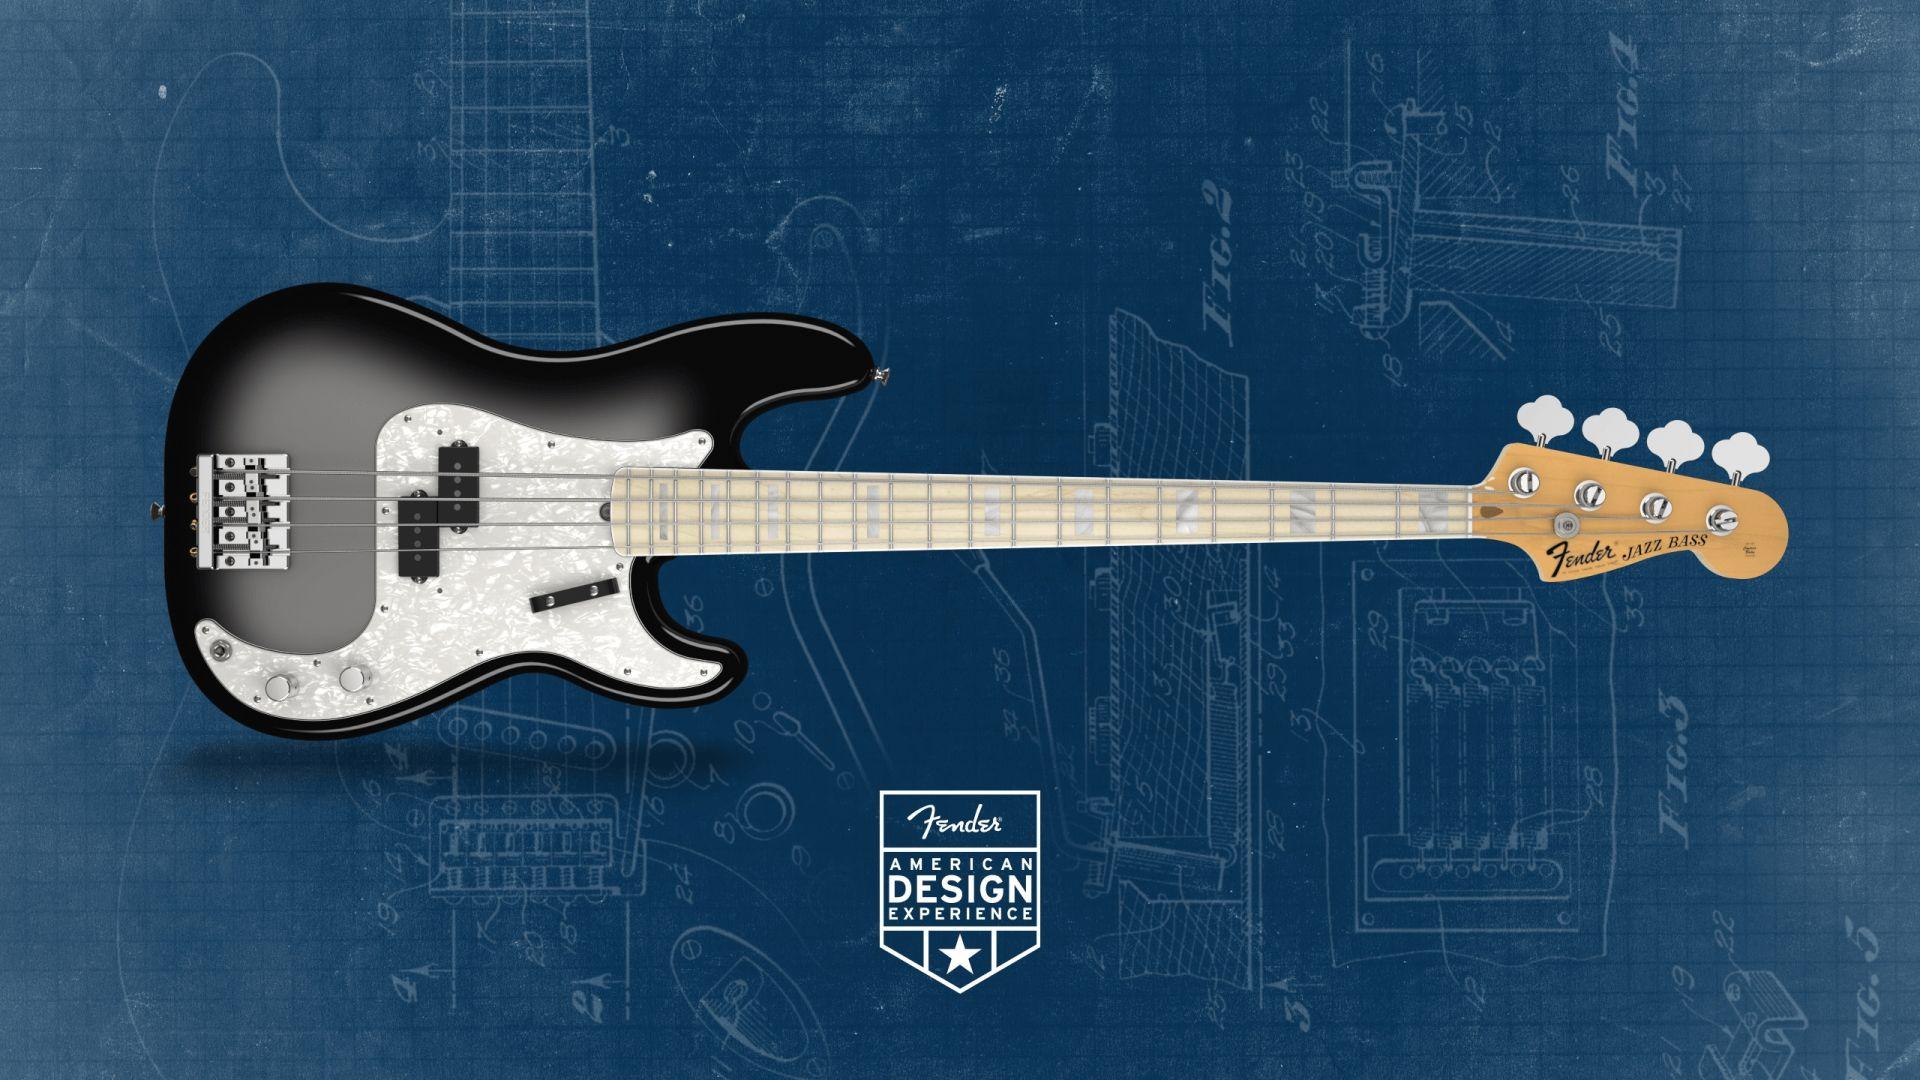 Fender Guitar, Picture